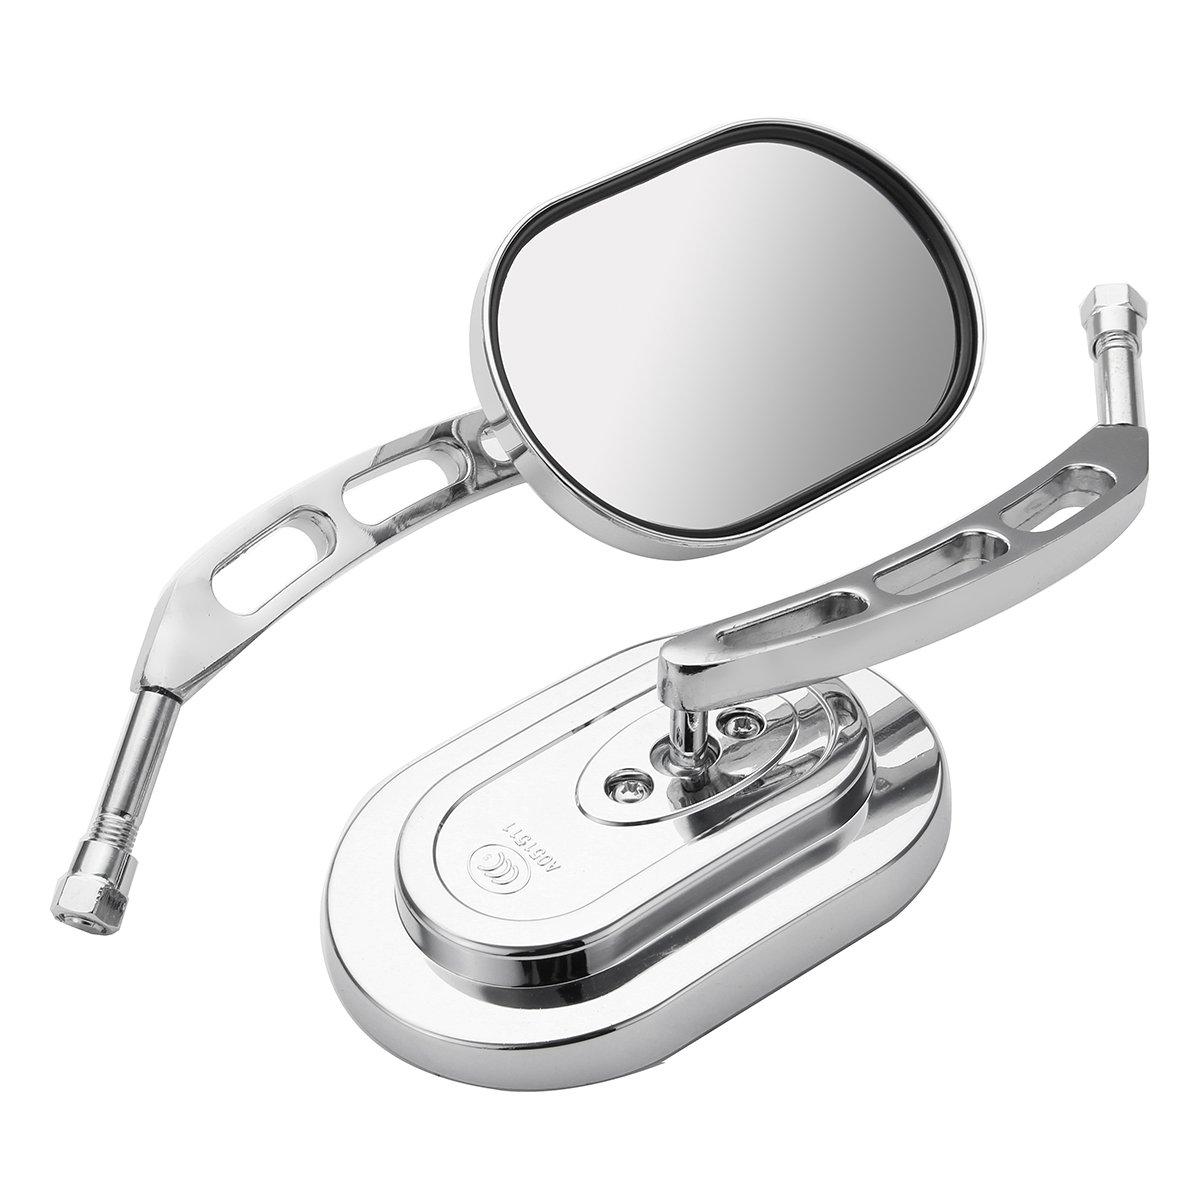 Kungfu Mall 10mm Universal Chrome Motorcycle Mirrors Rear View Side Mirror For Harley/Suzuki/Honda